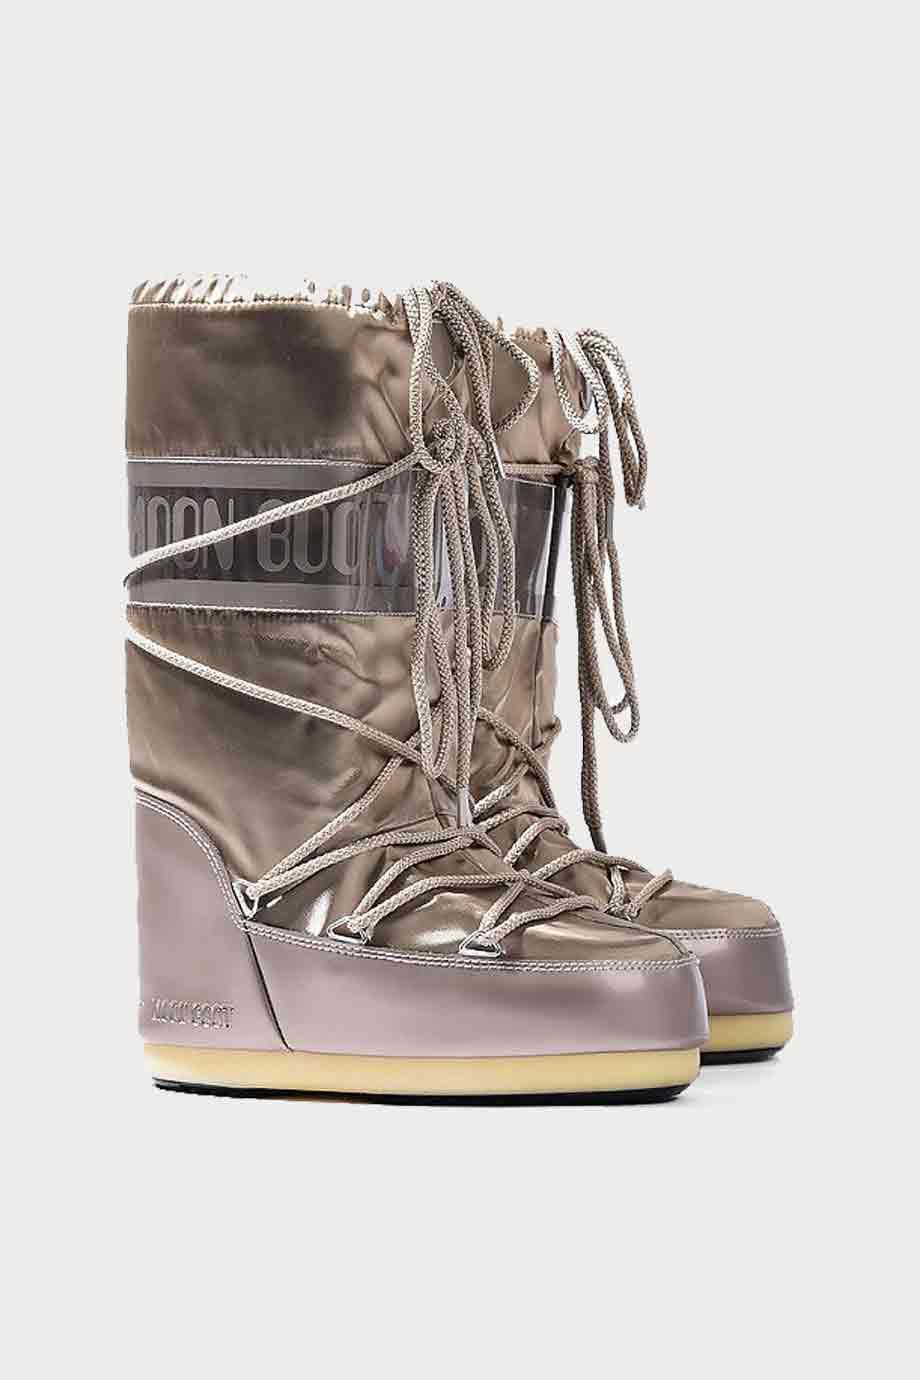 spiridoula metheniti shoes xalkida p 14016800 001 rose gold high MoonBoot 3